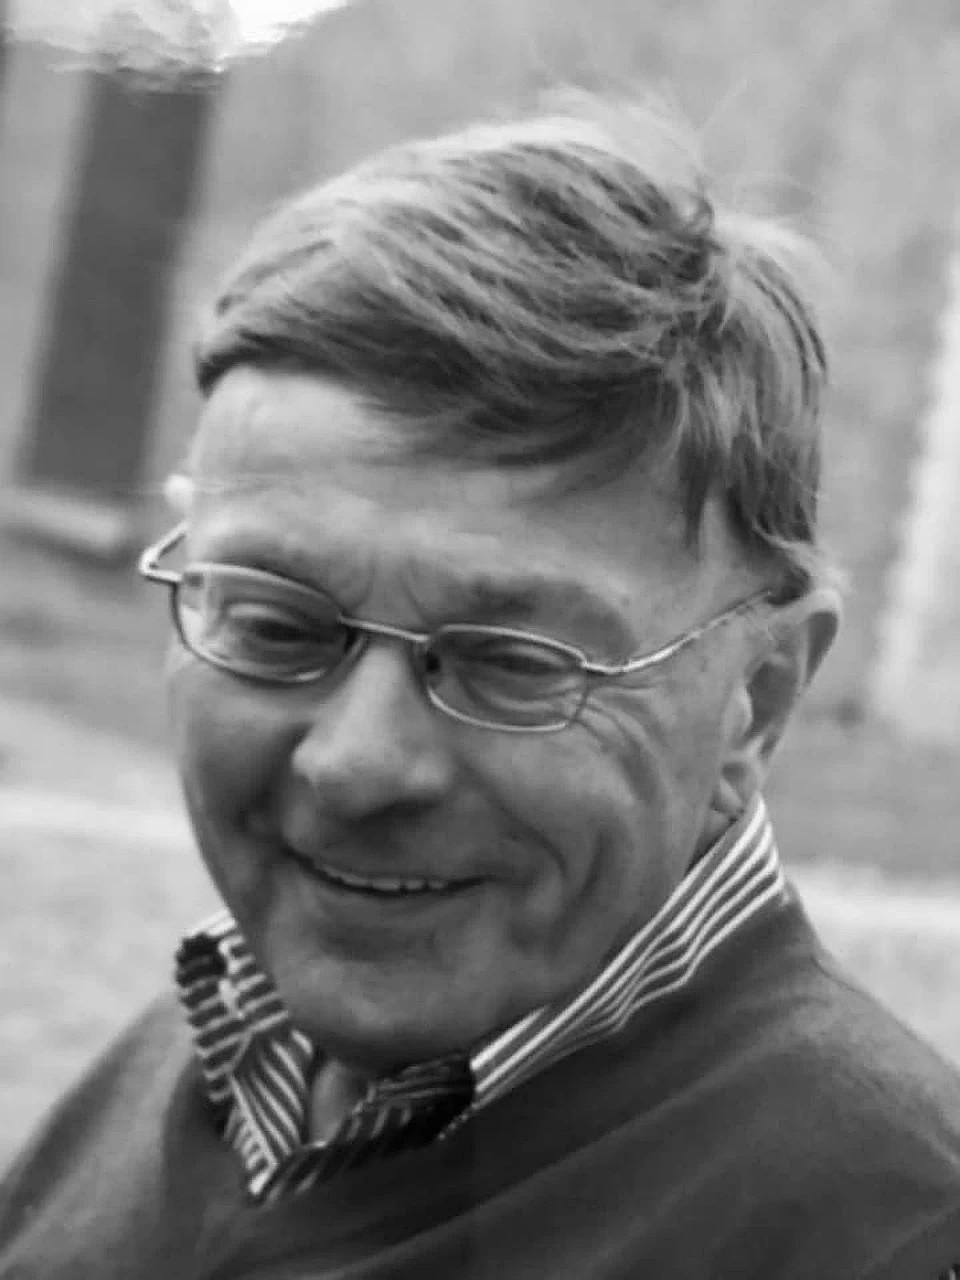 71-летни1 гражданин Норвегии Даг Вивестад